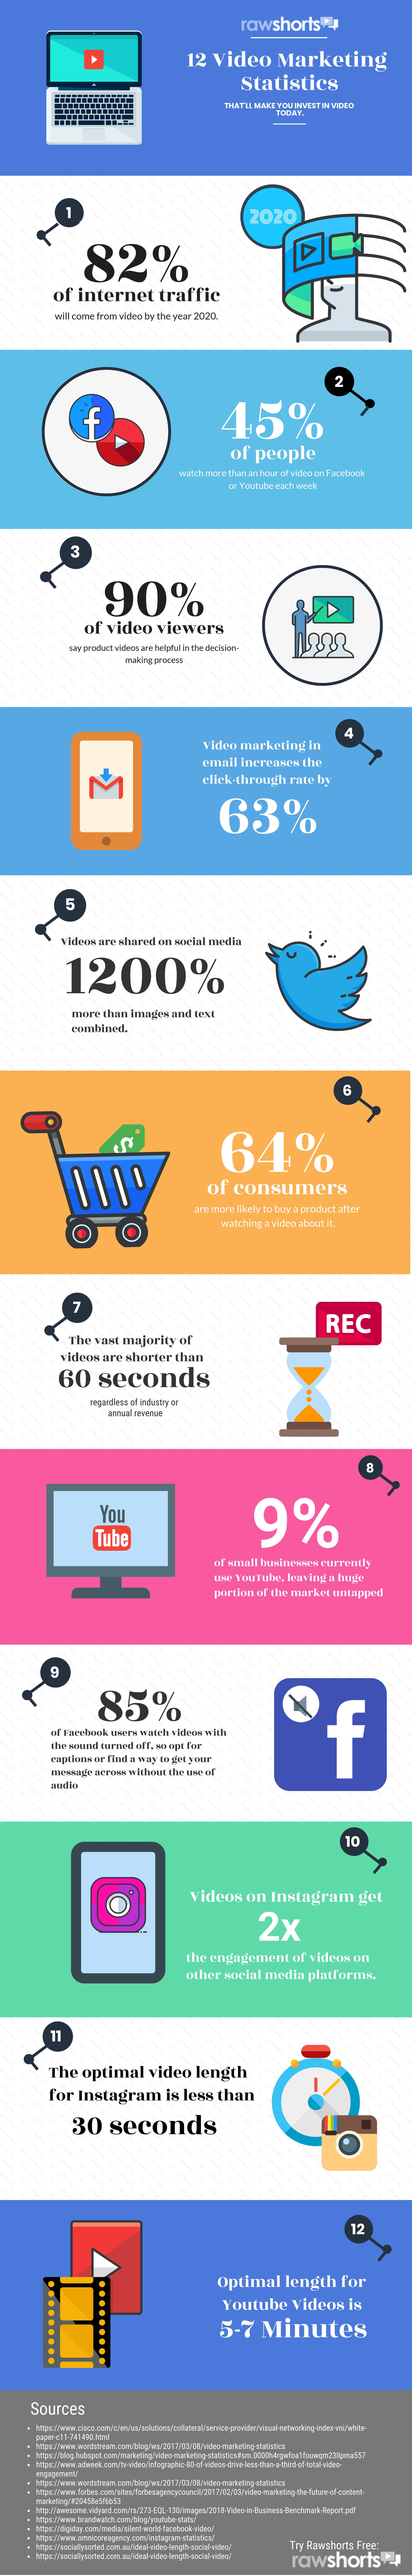 Infographic: Video Marketing Statistics